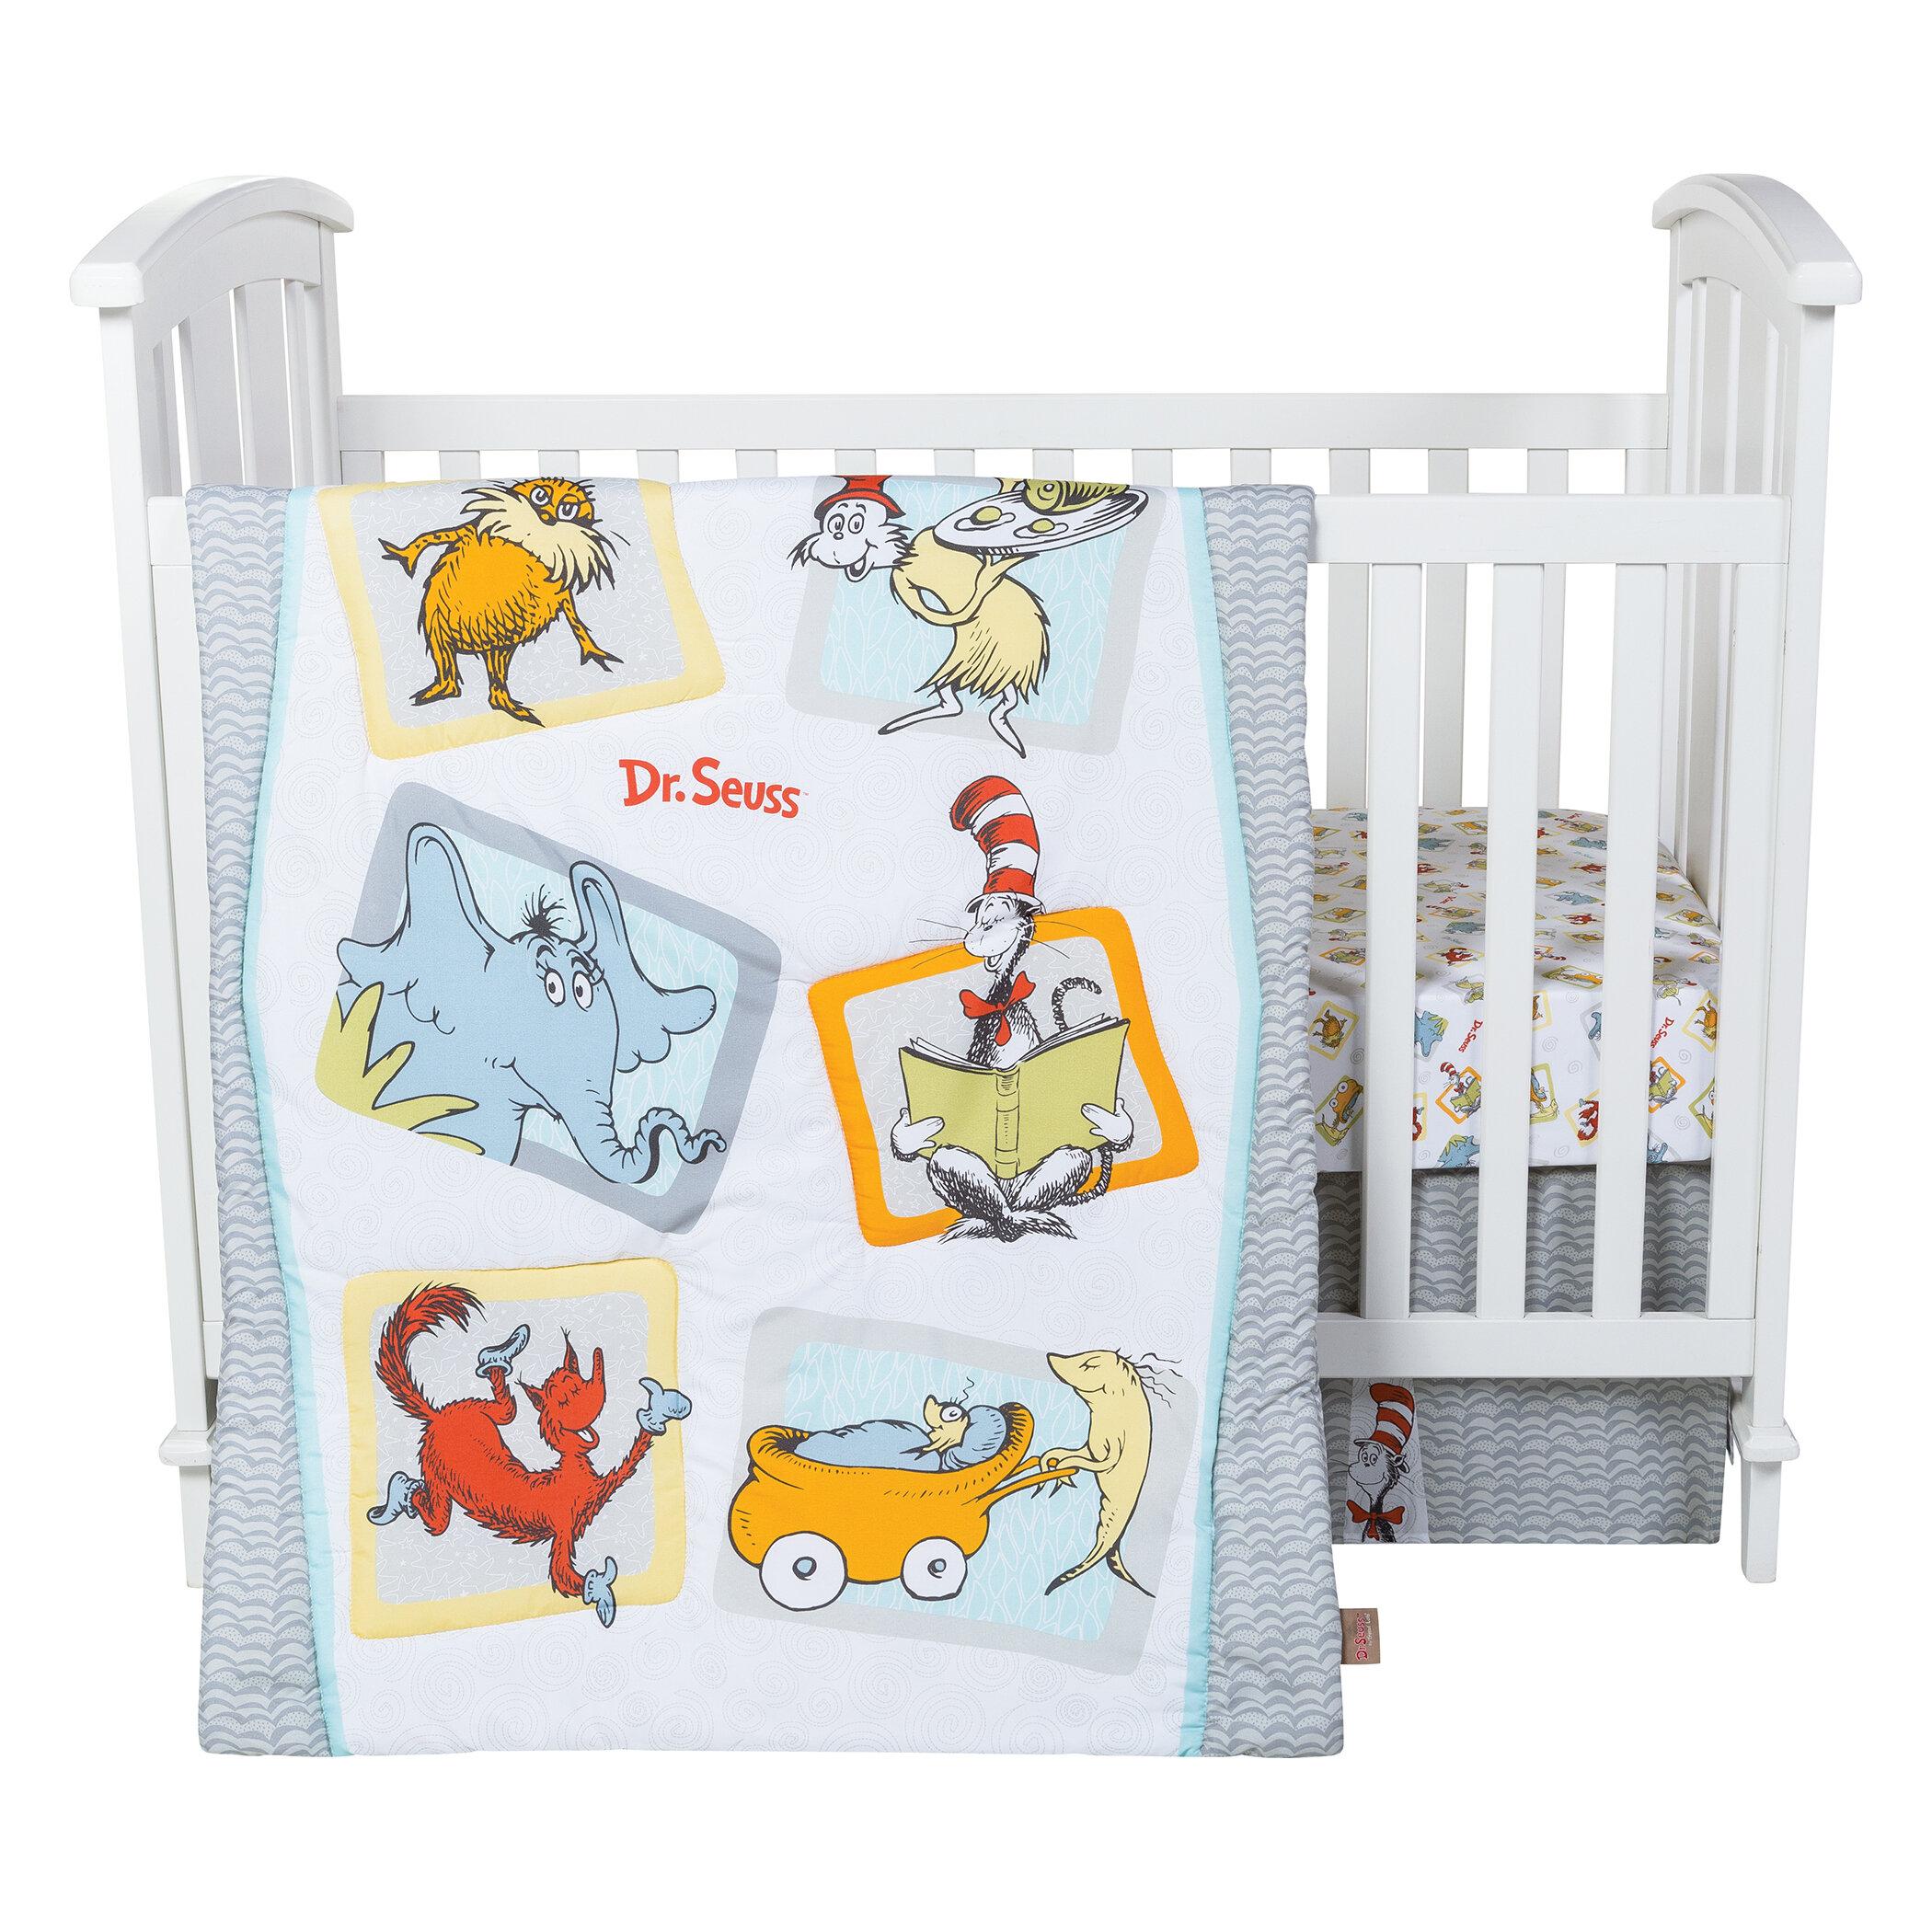 Trend Lab Dr. Seuss Friends 5 Piece Crib Bedding Set U0026 Reviews | Wayfair